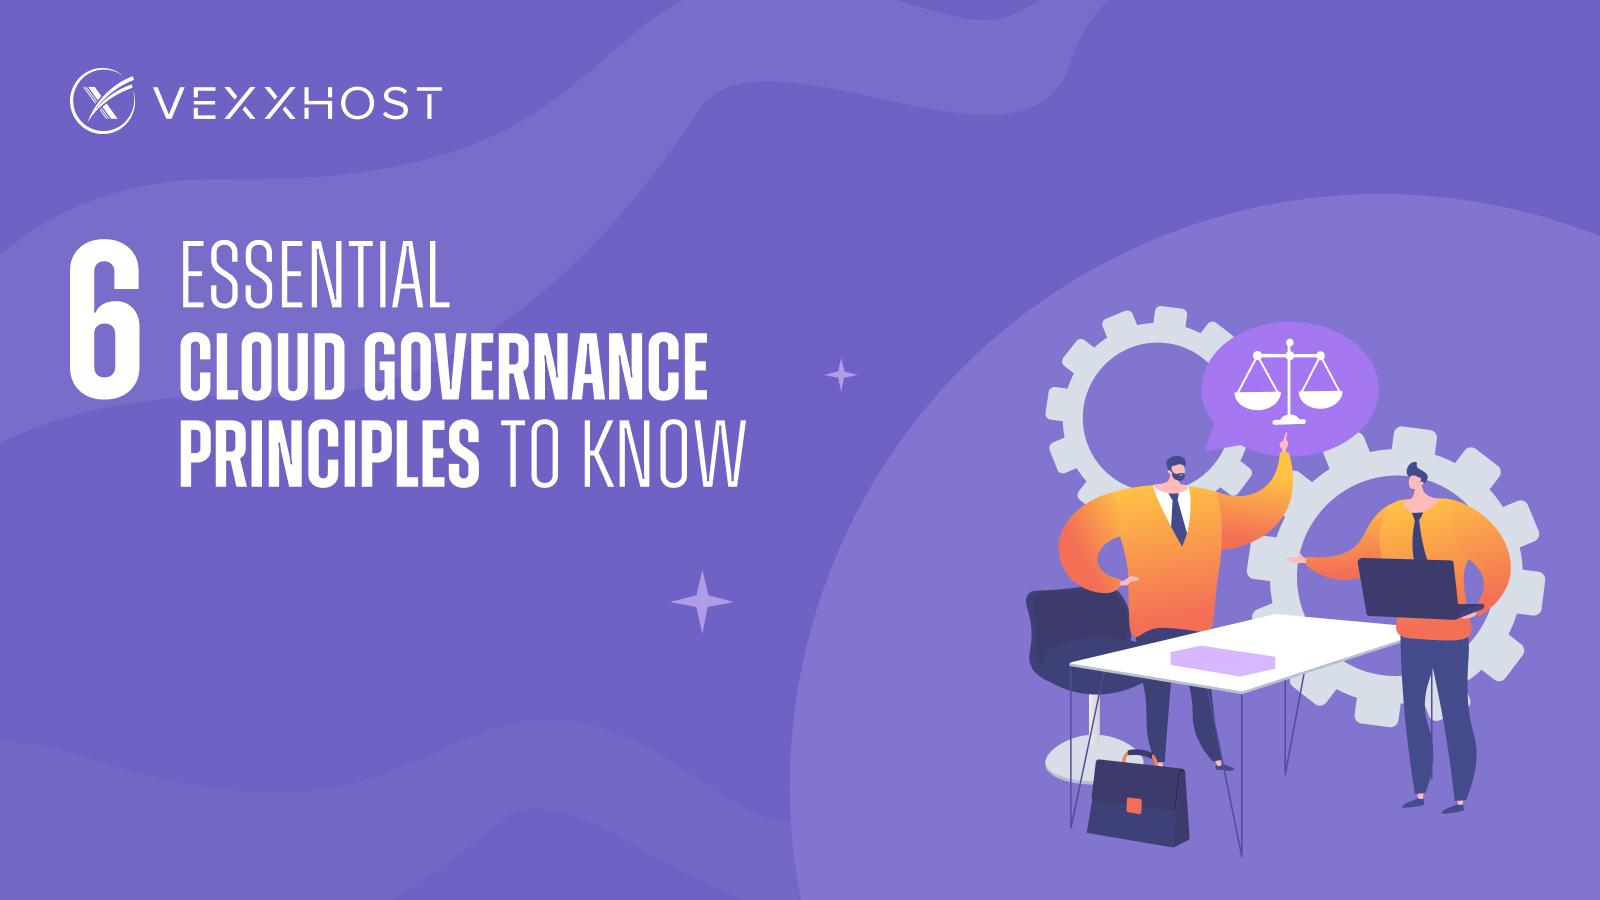 6 Essential Cloud Governance Principles to Know